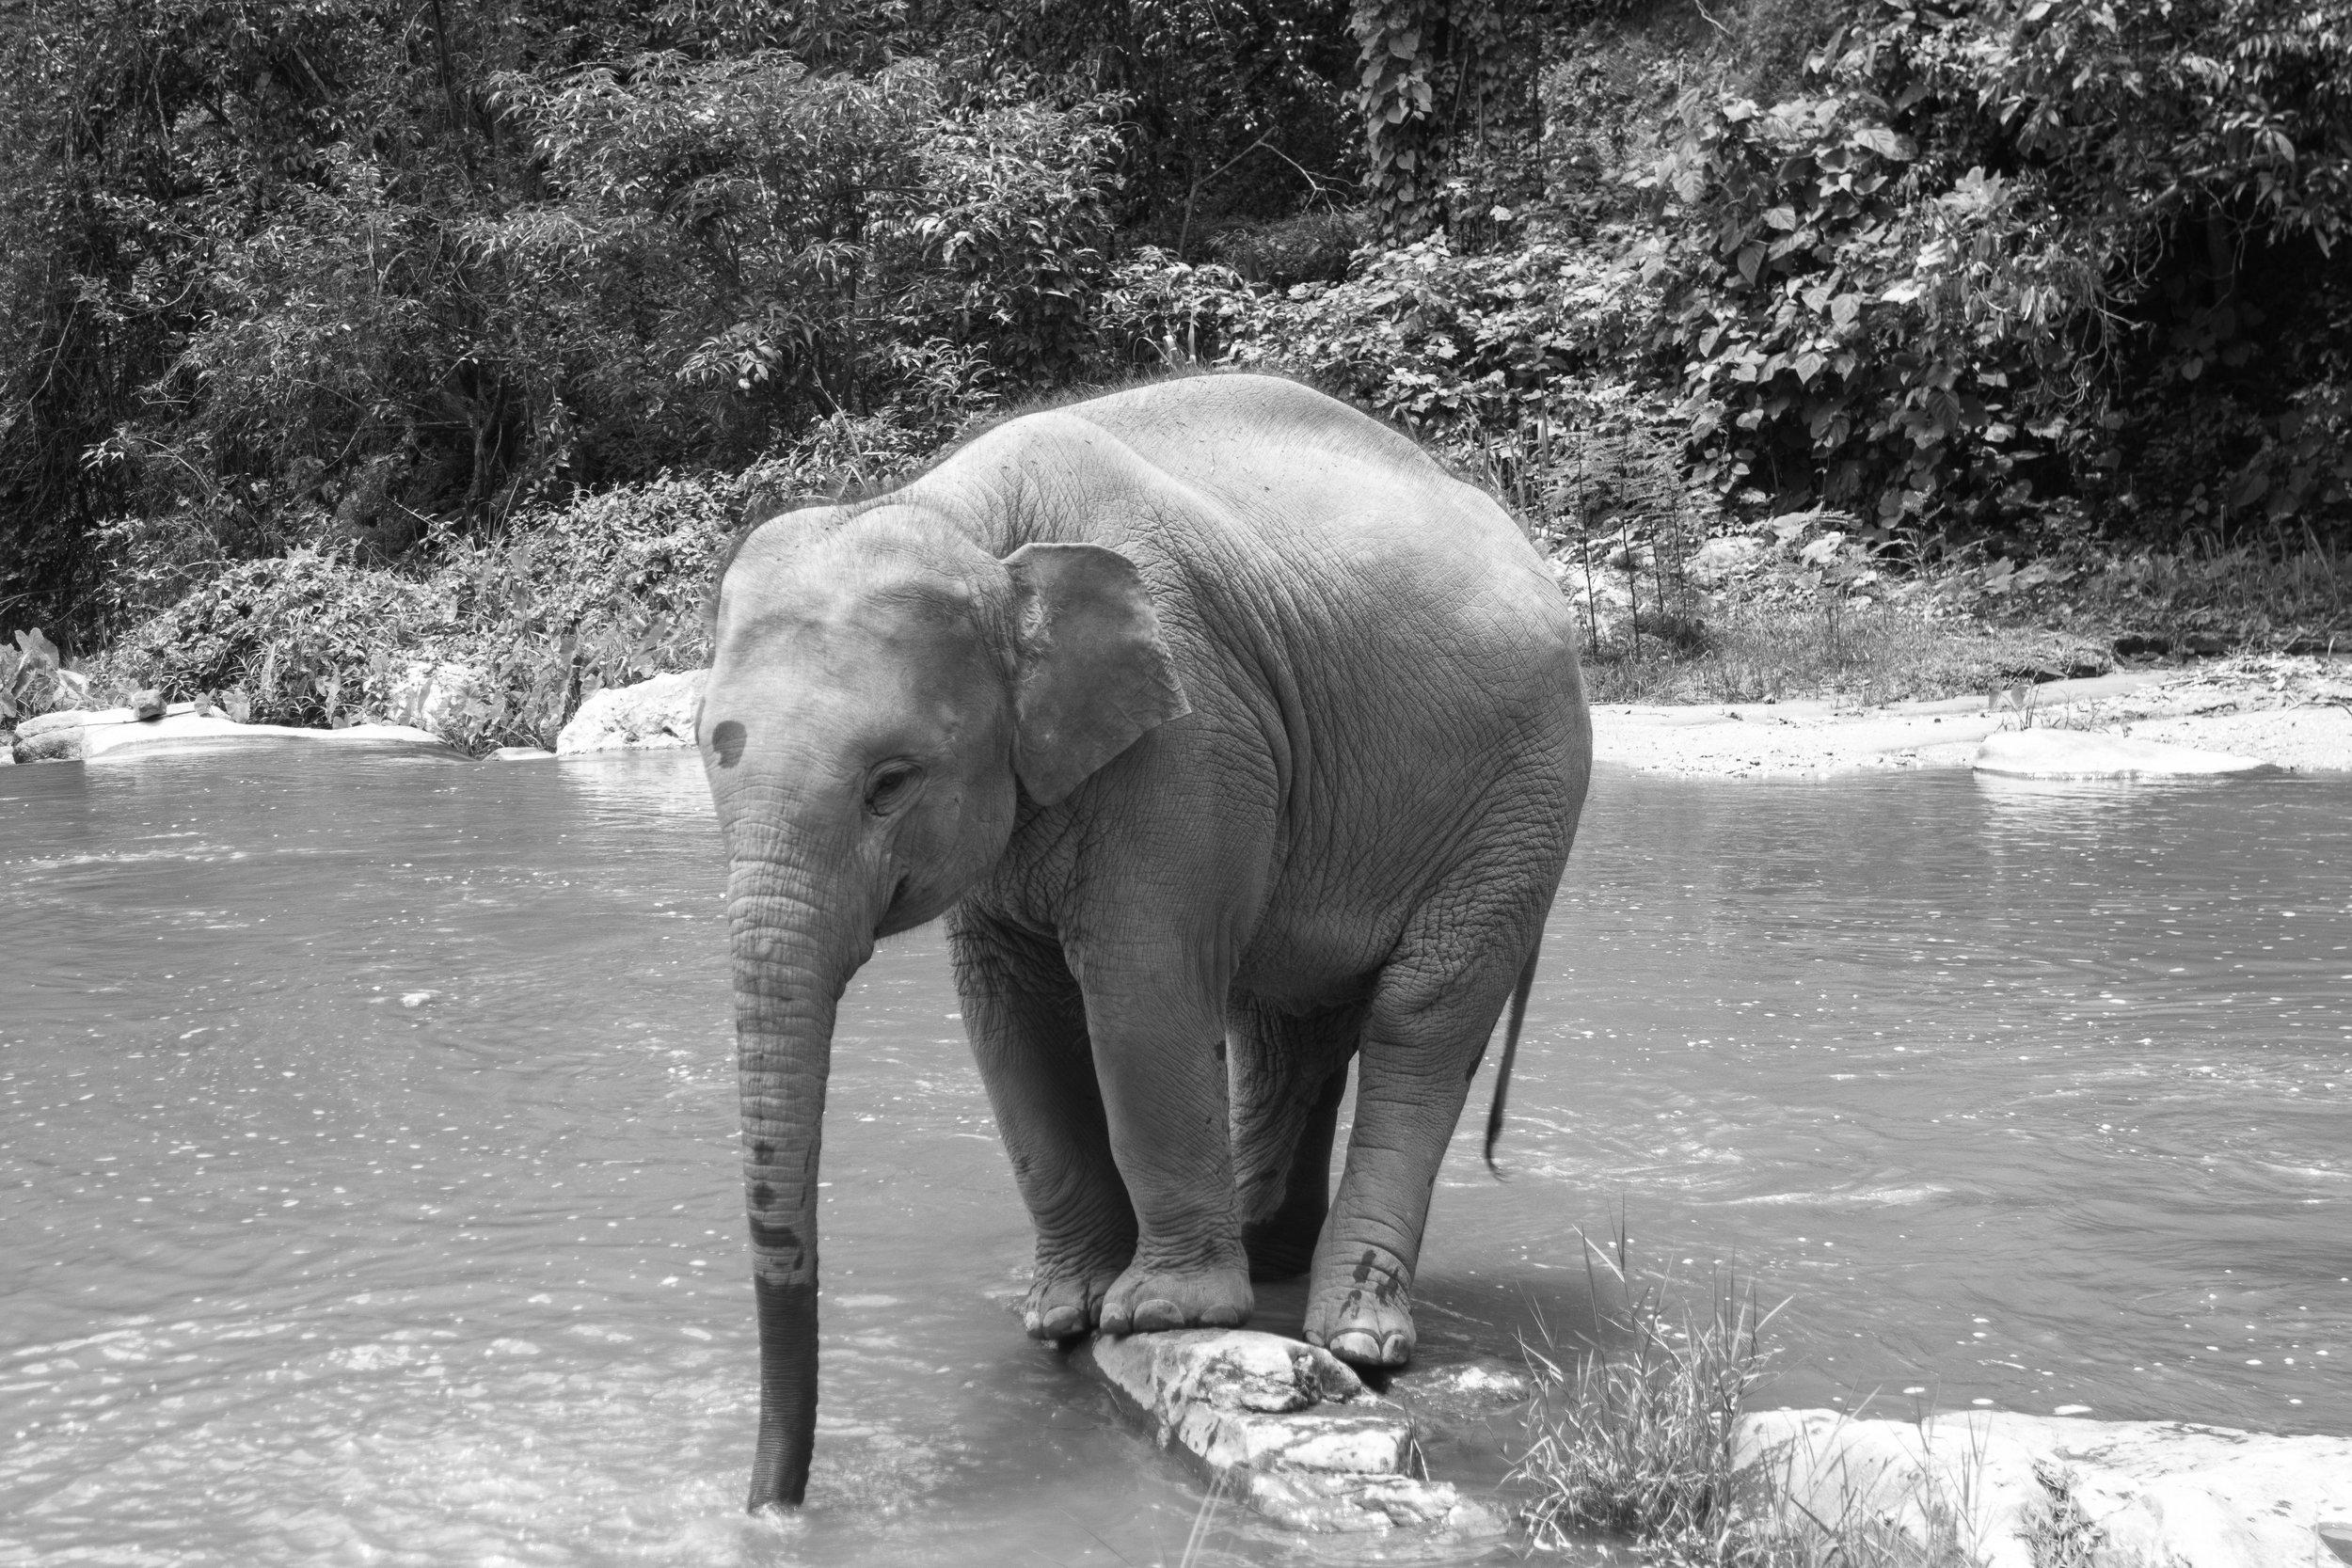 The-world-of-elephants-black-and-white-Thailand-playful.jpg